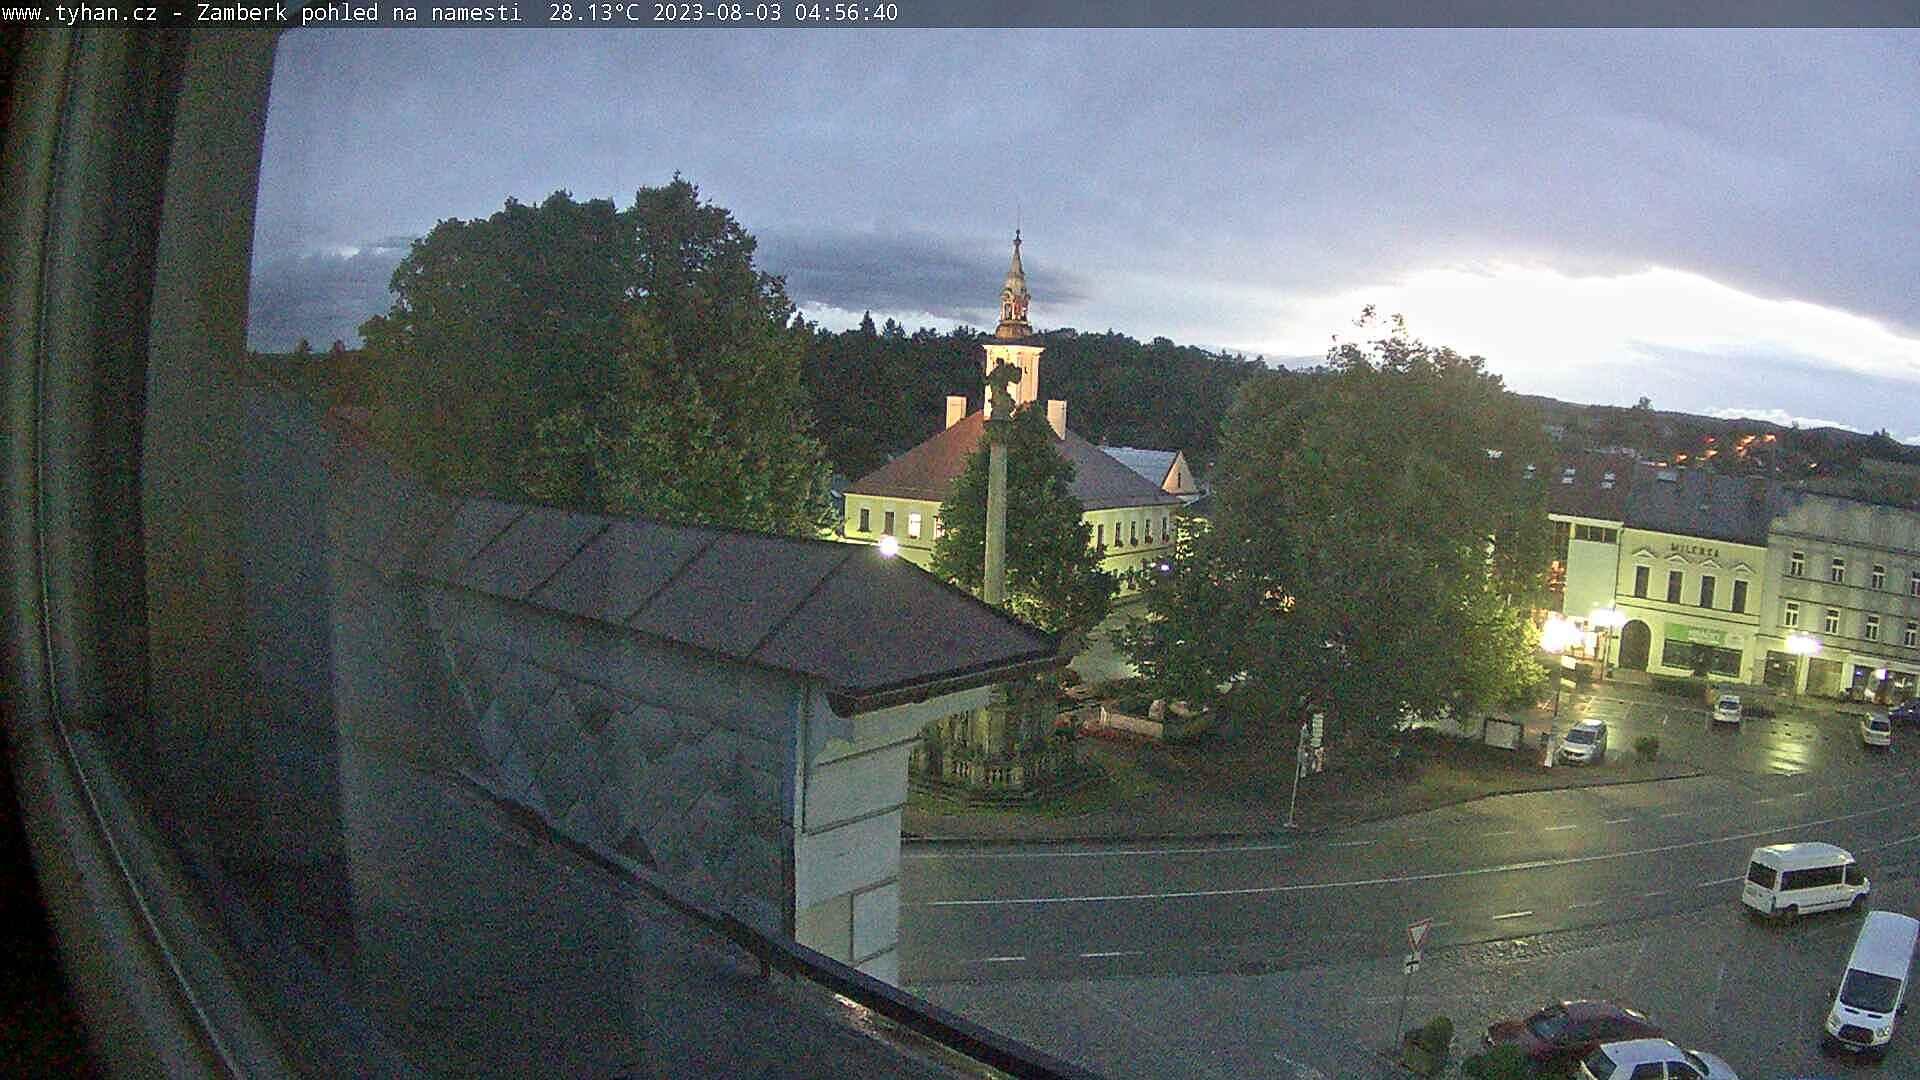 Webkamera - Žamberk